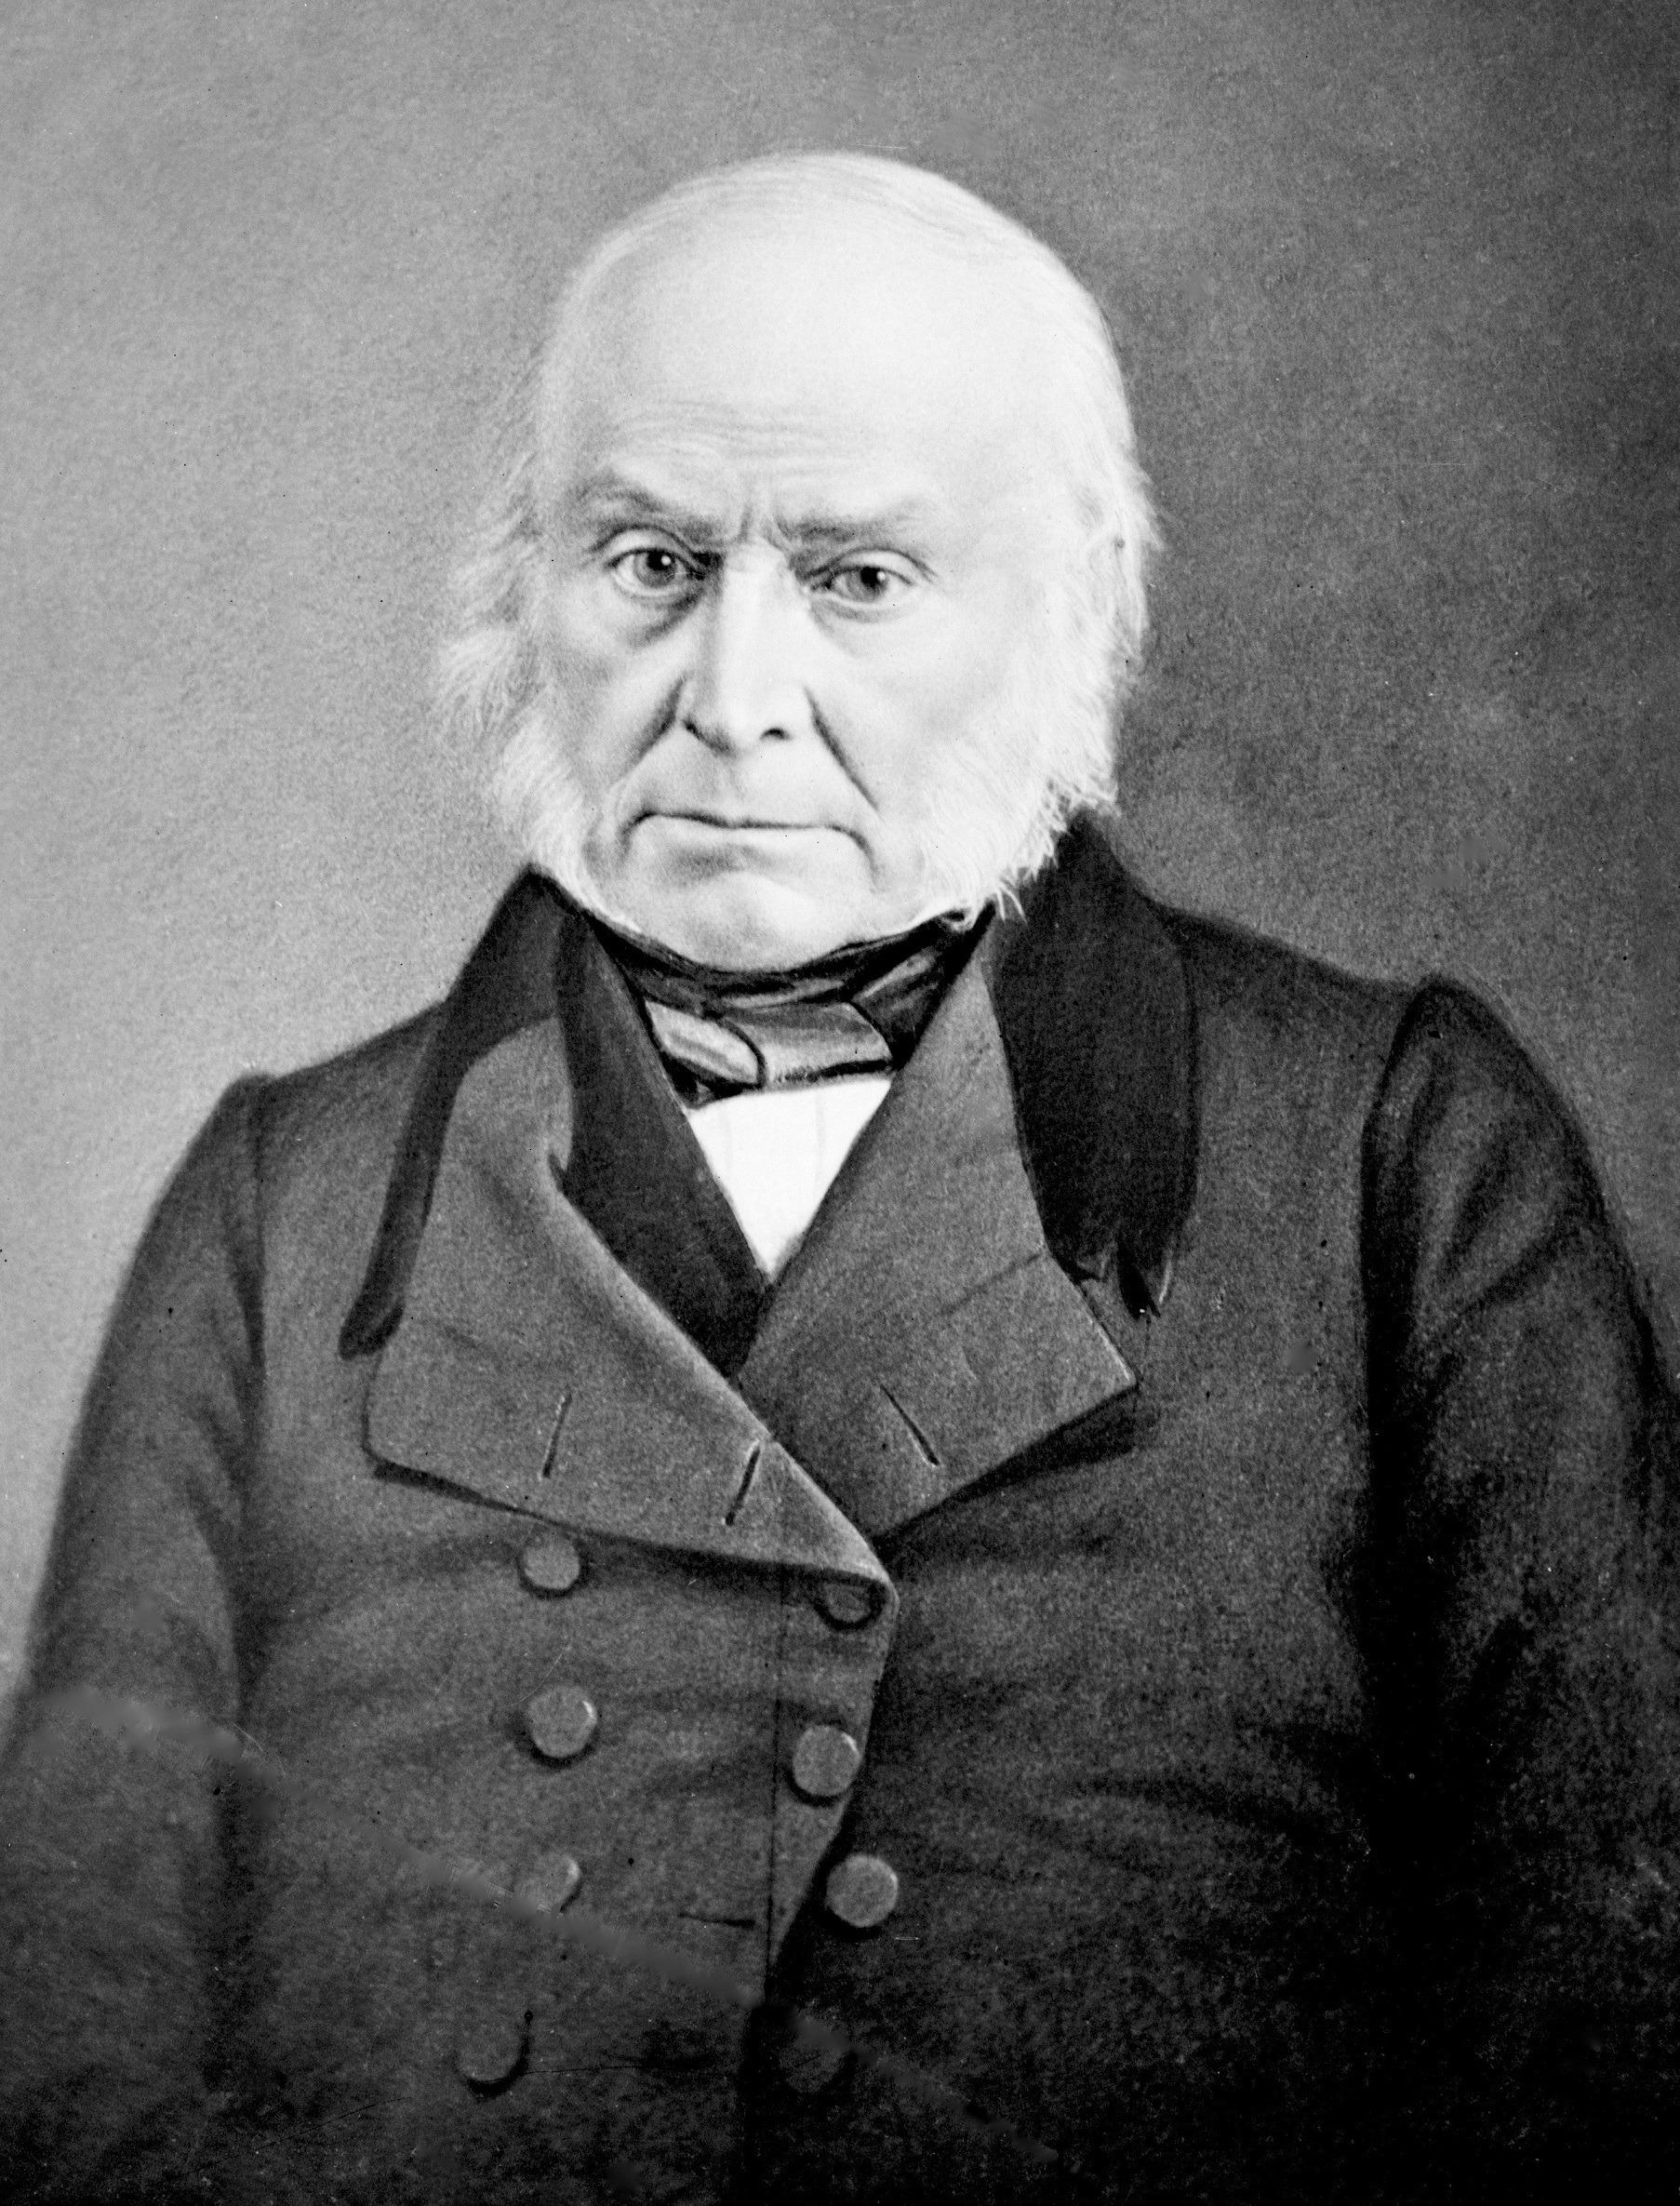 John Quincy Adams, sixth president of the U.S.